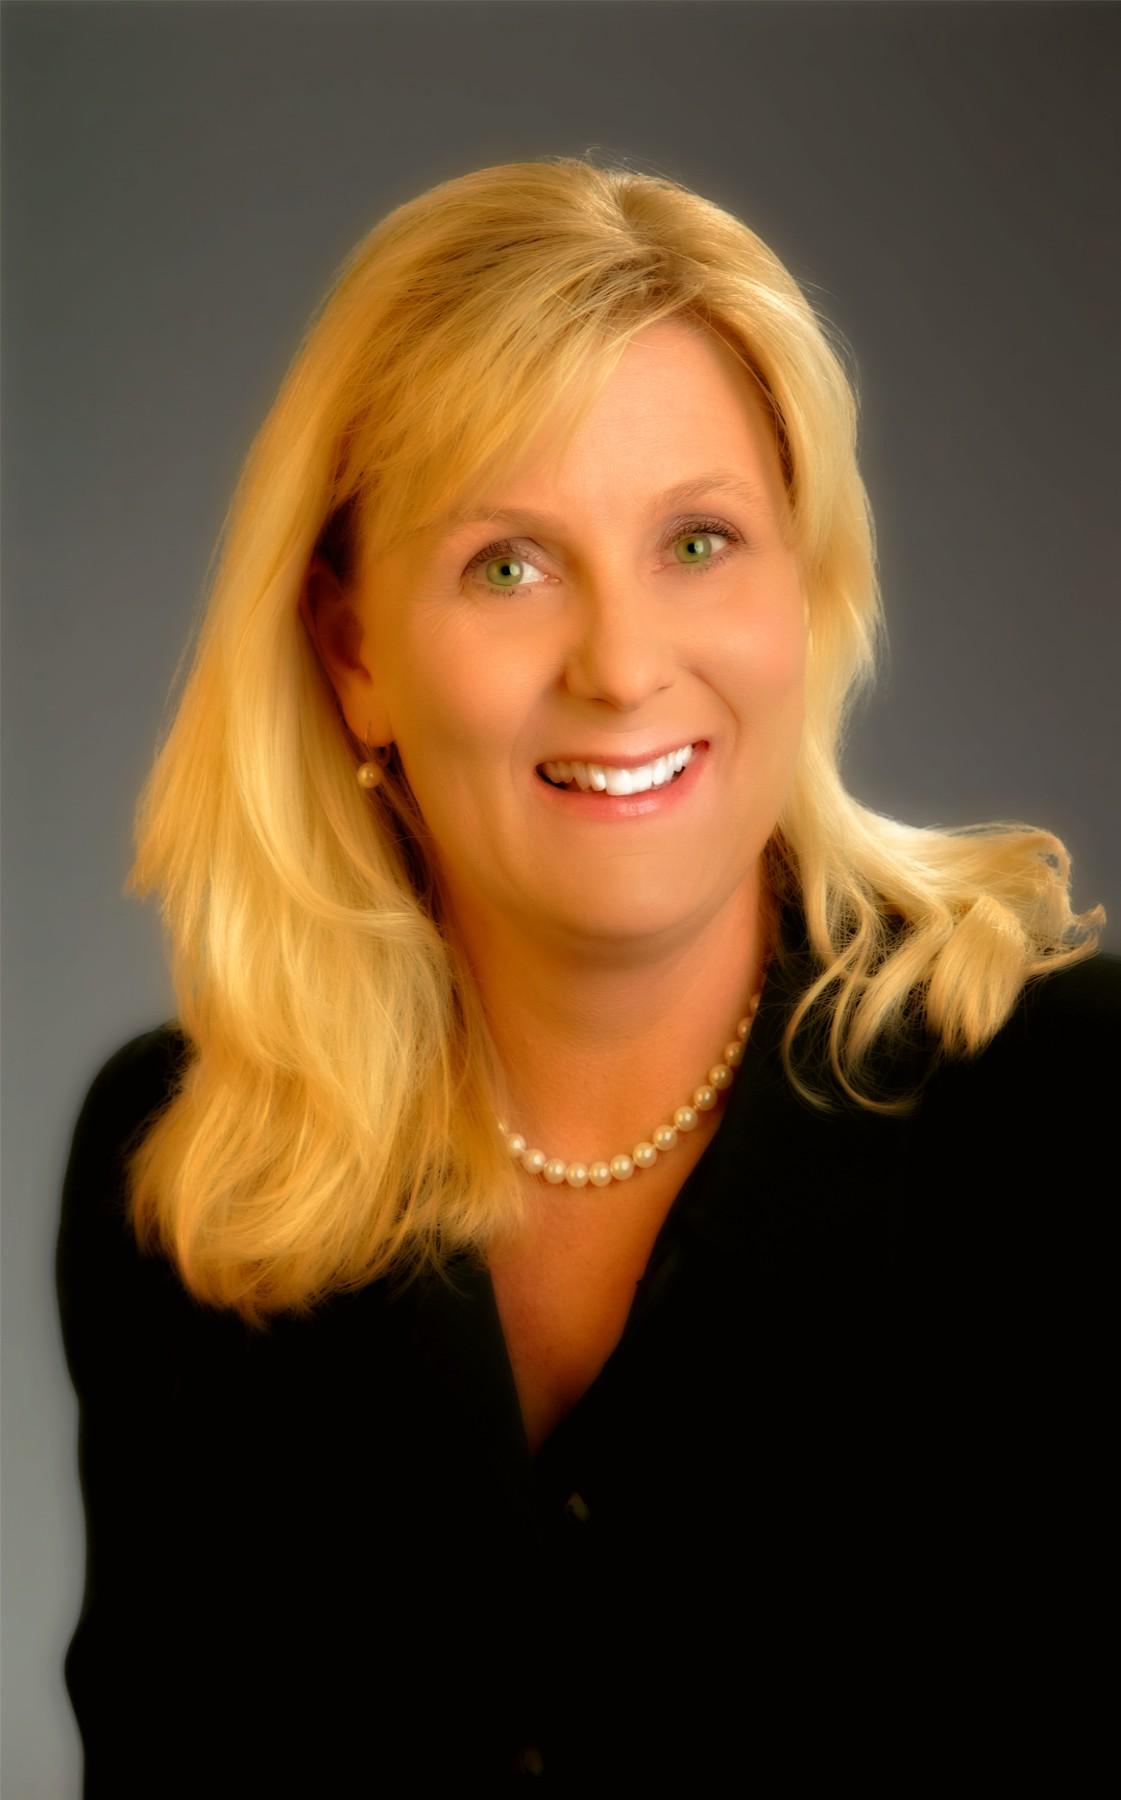 Michelle Pitsenberger